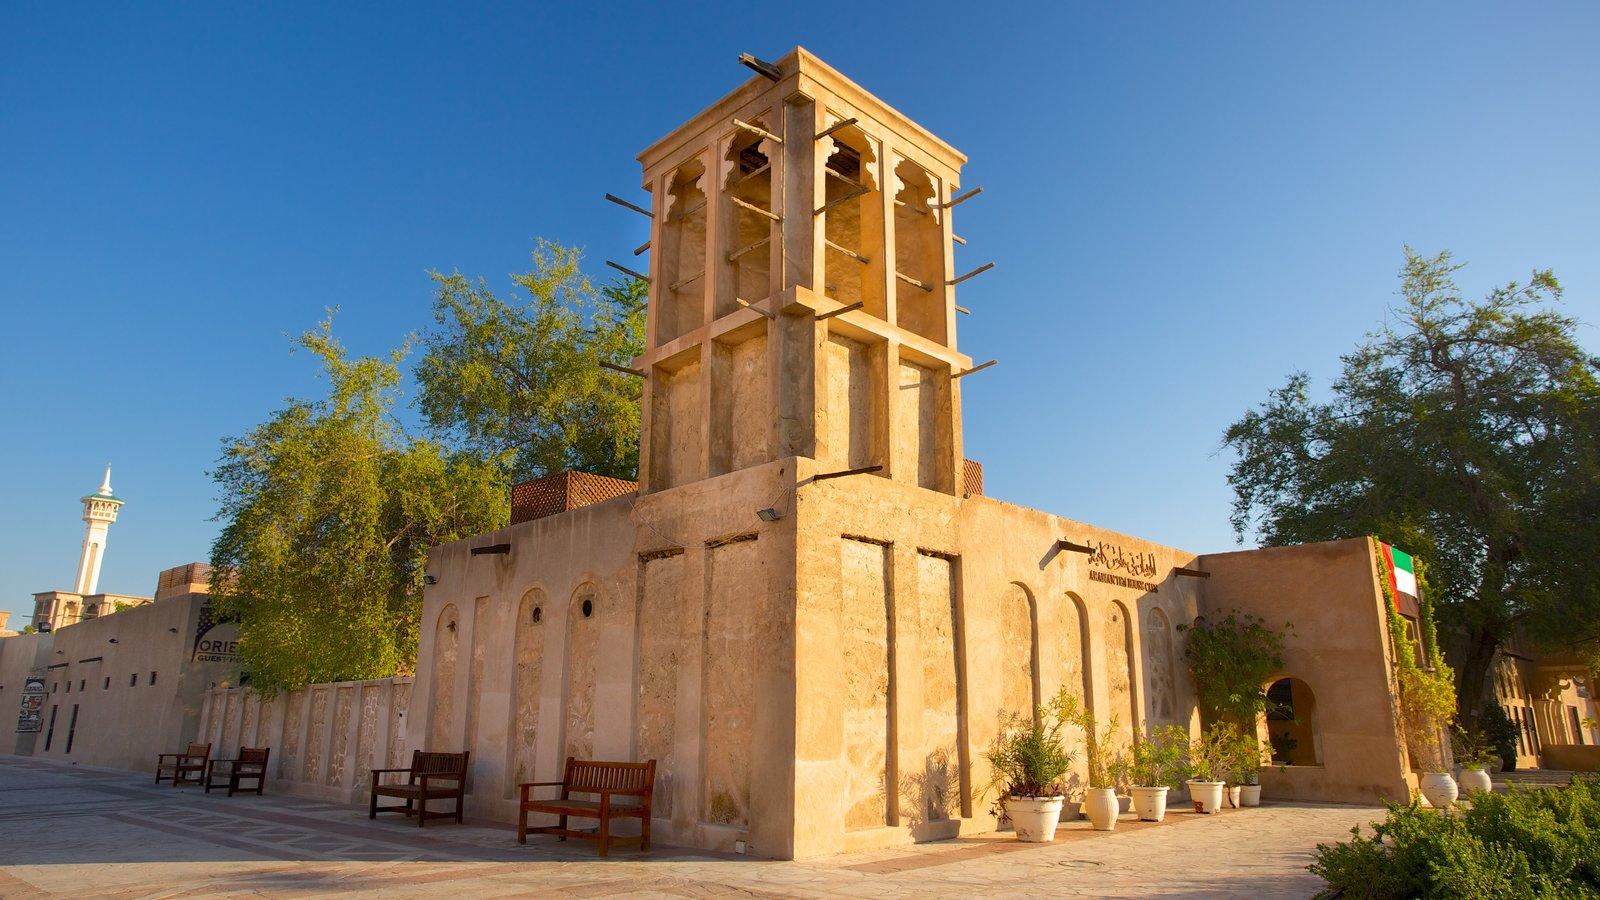 Dubai Emirate caracterizando arquitetura de patrimônio